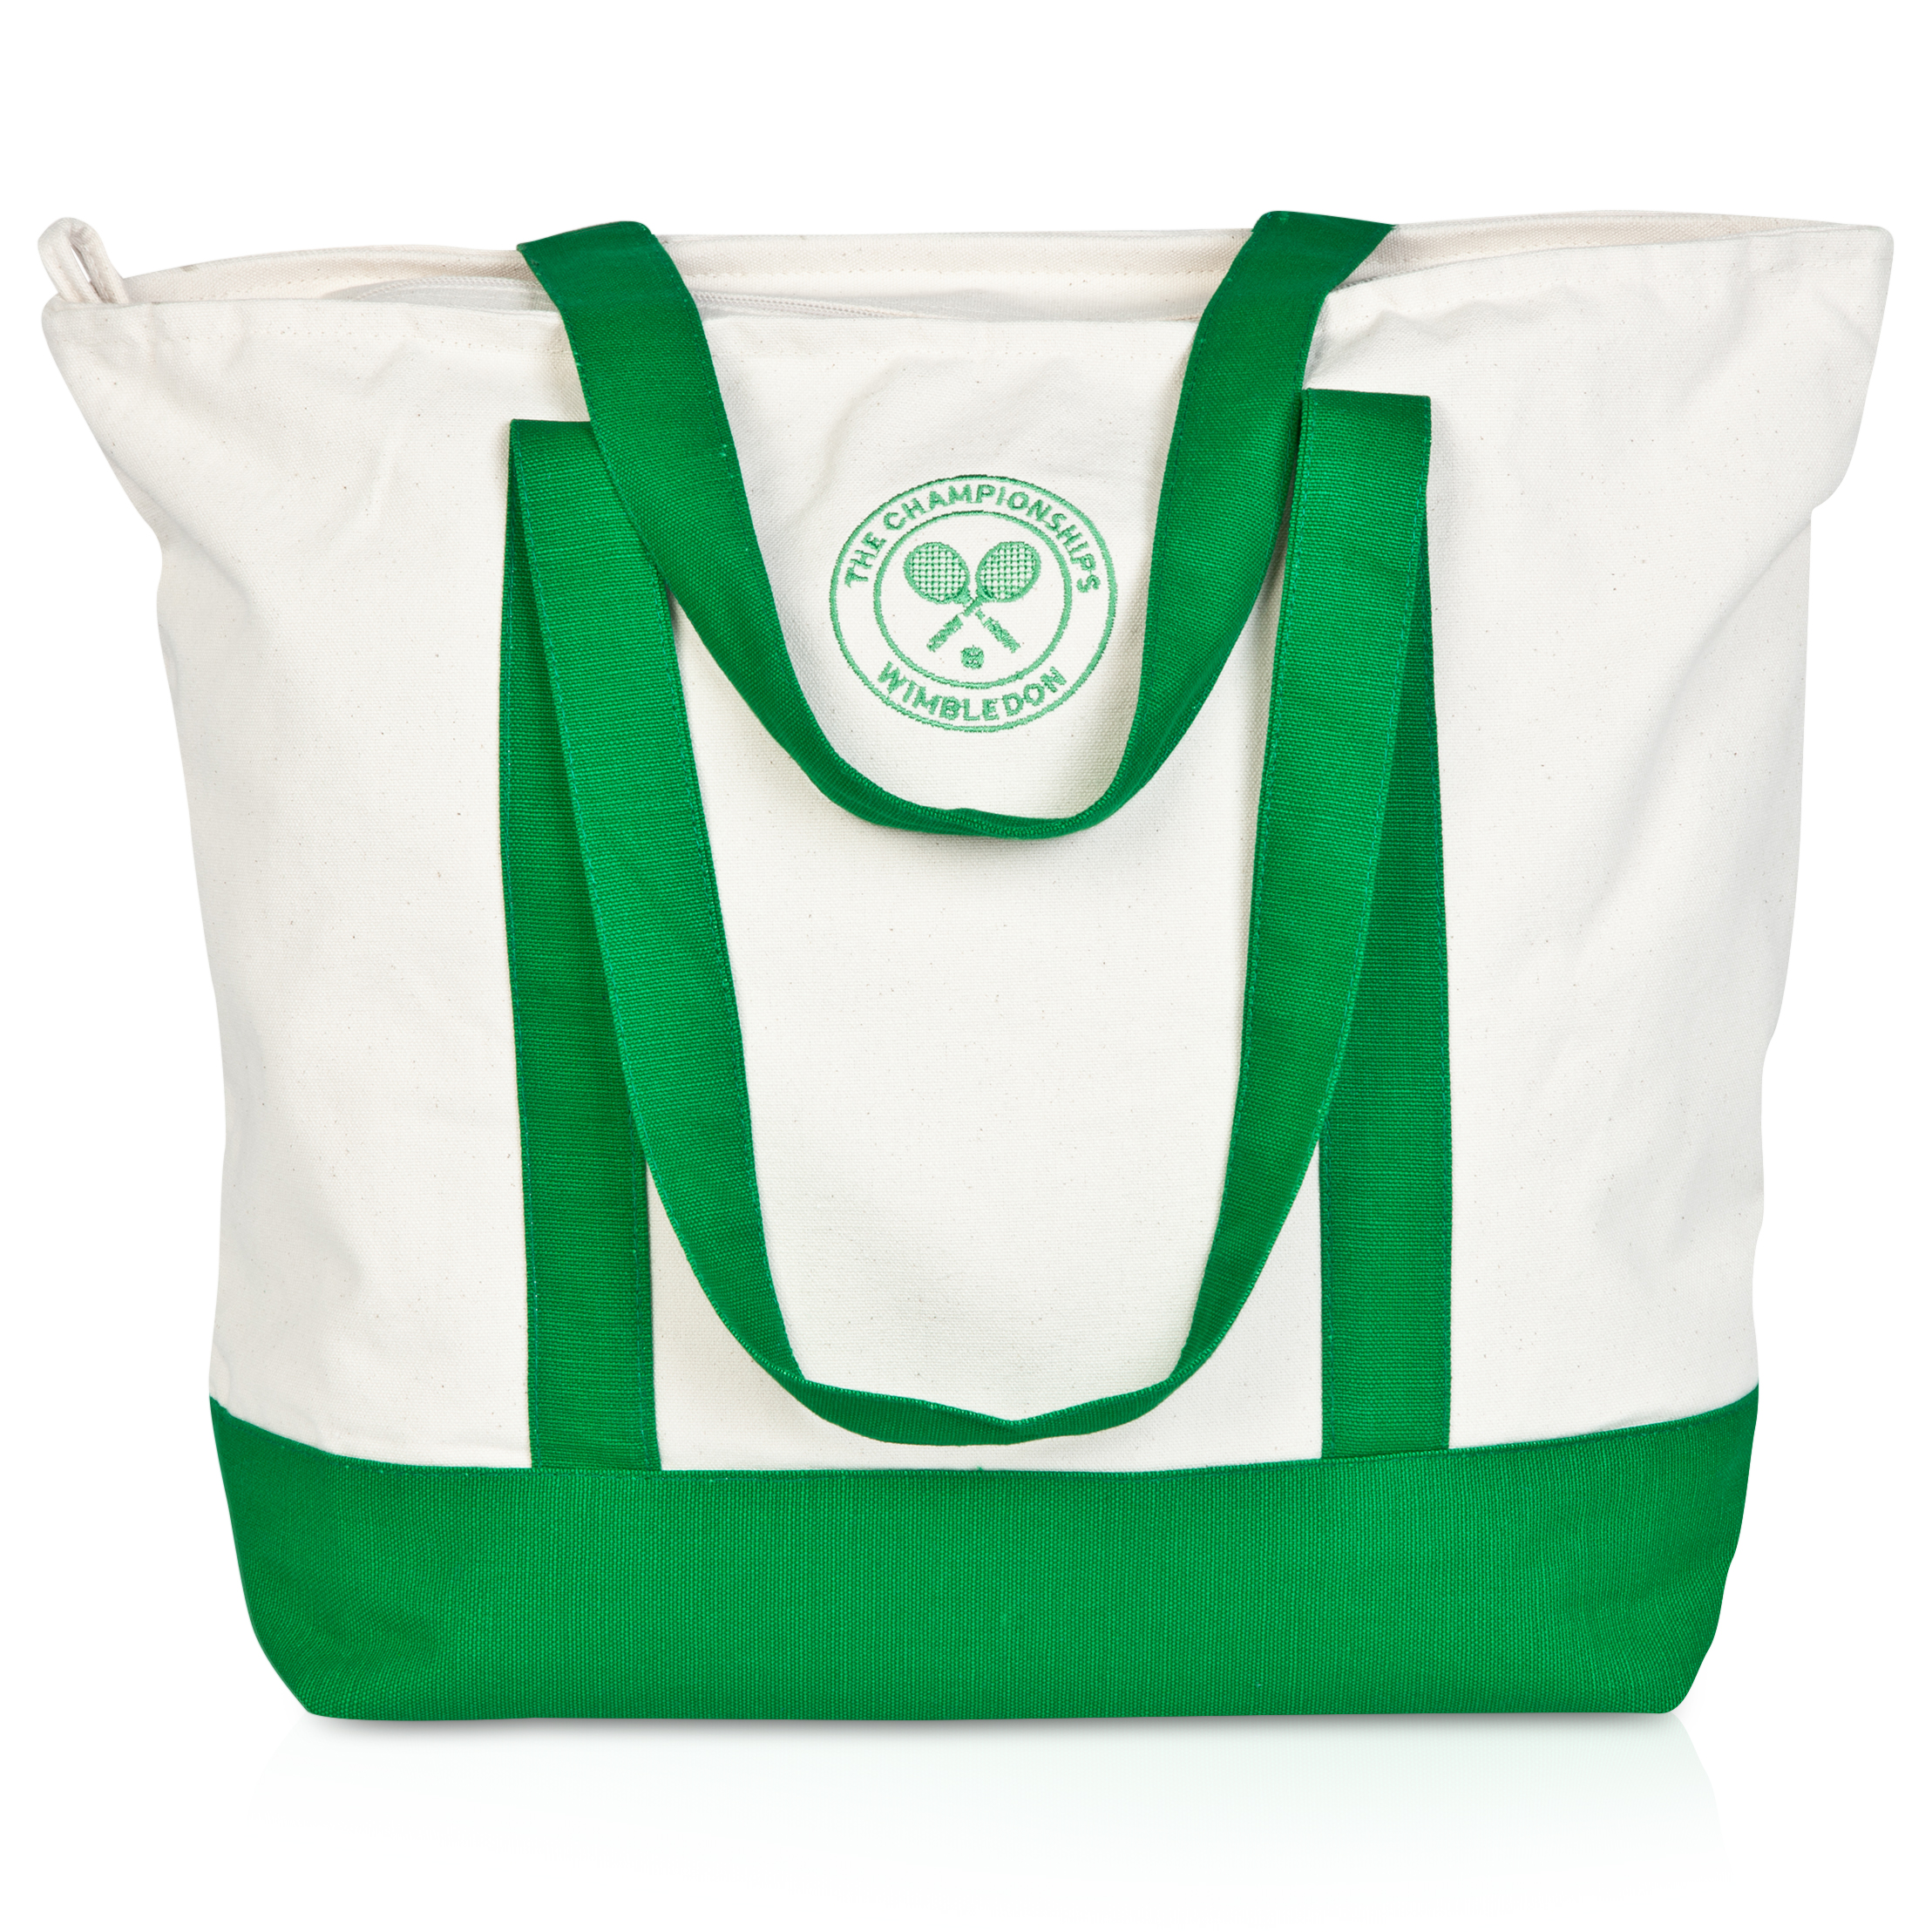 Wimbledon Boat Bag Green